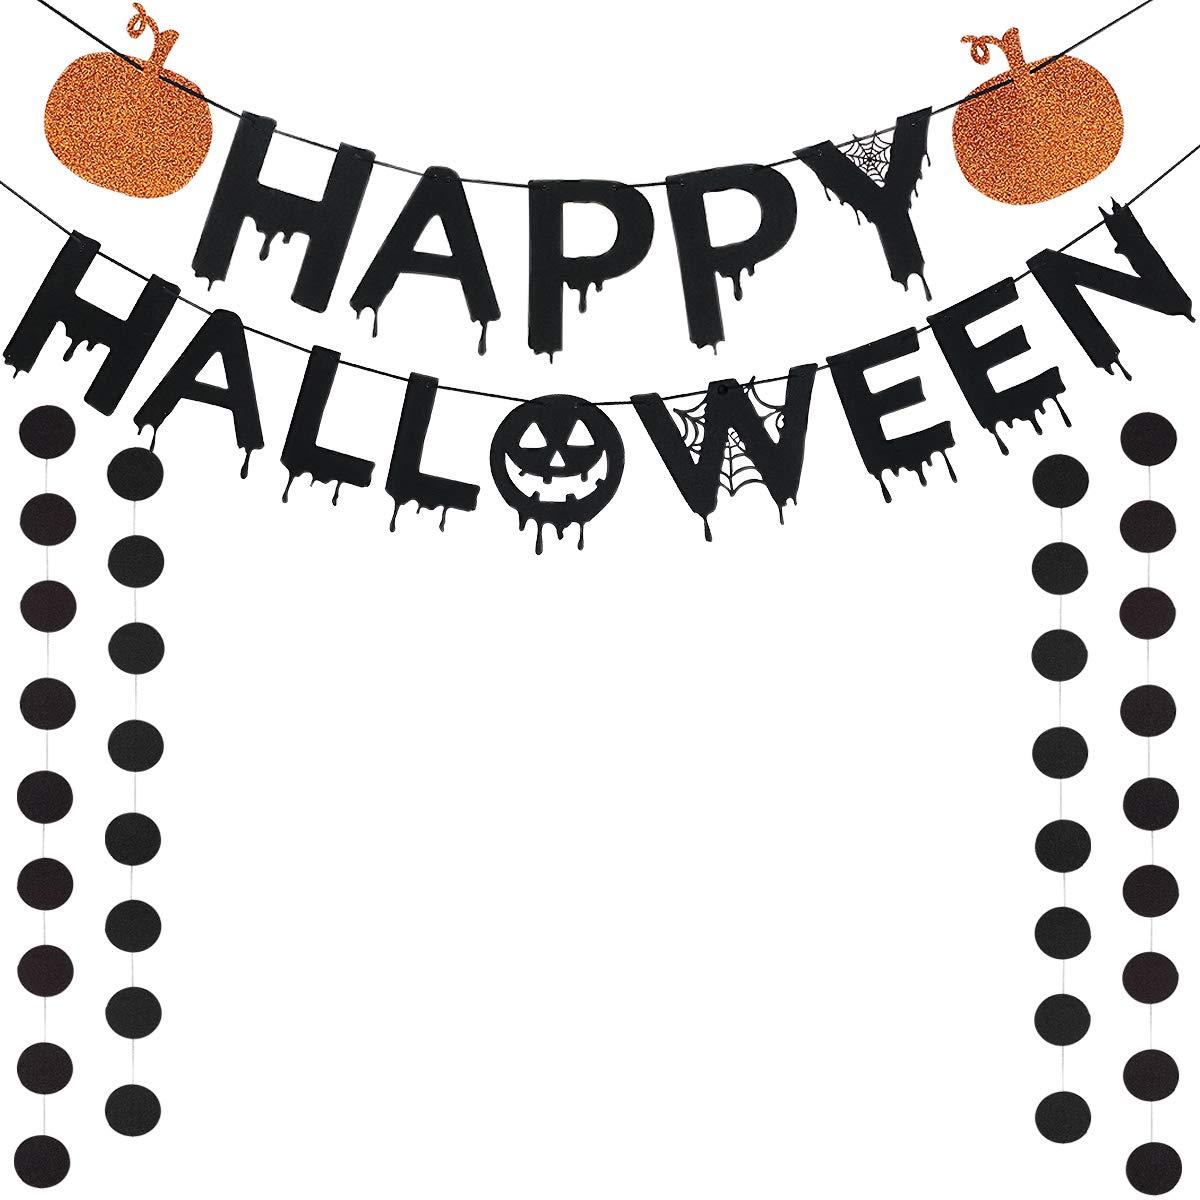 Black Glittery Happy Halloween Orange Pumpkin Banner and Black Circle Dots Garland -Home Decor Sign Outdoor Indoor Halloween Party Decoration Supplies